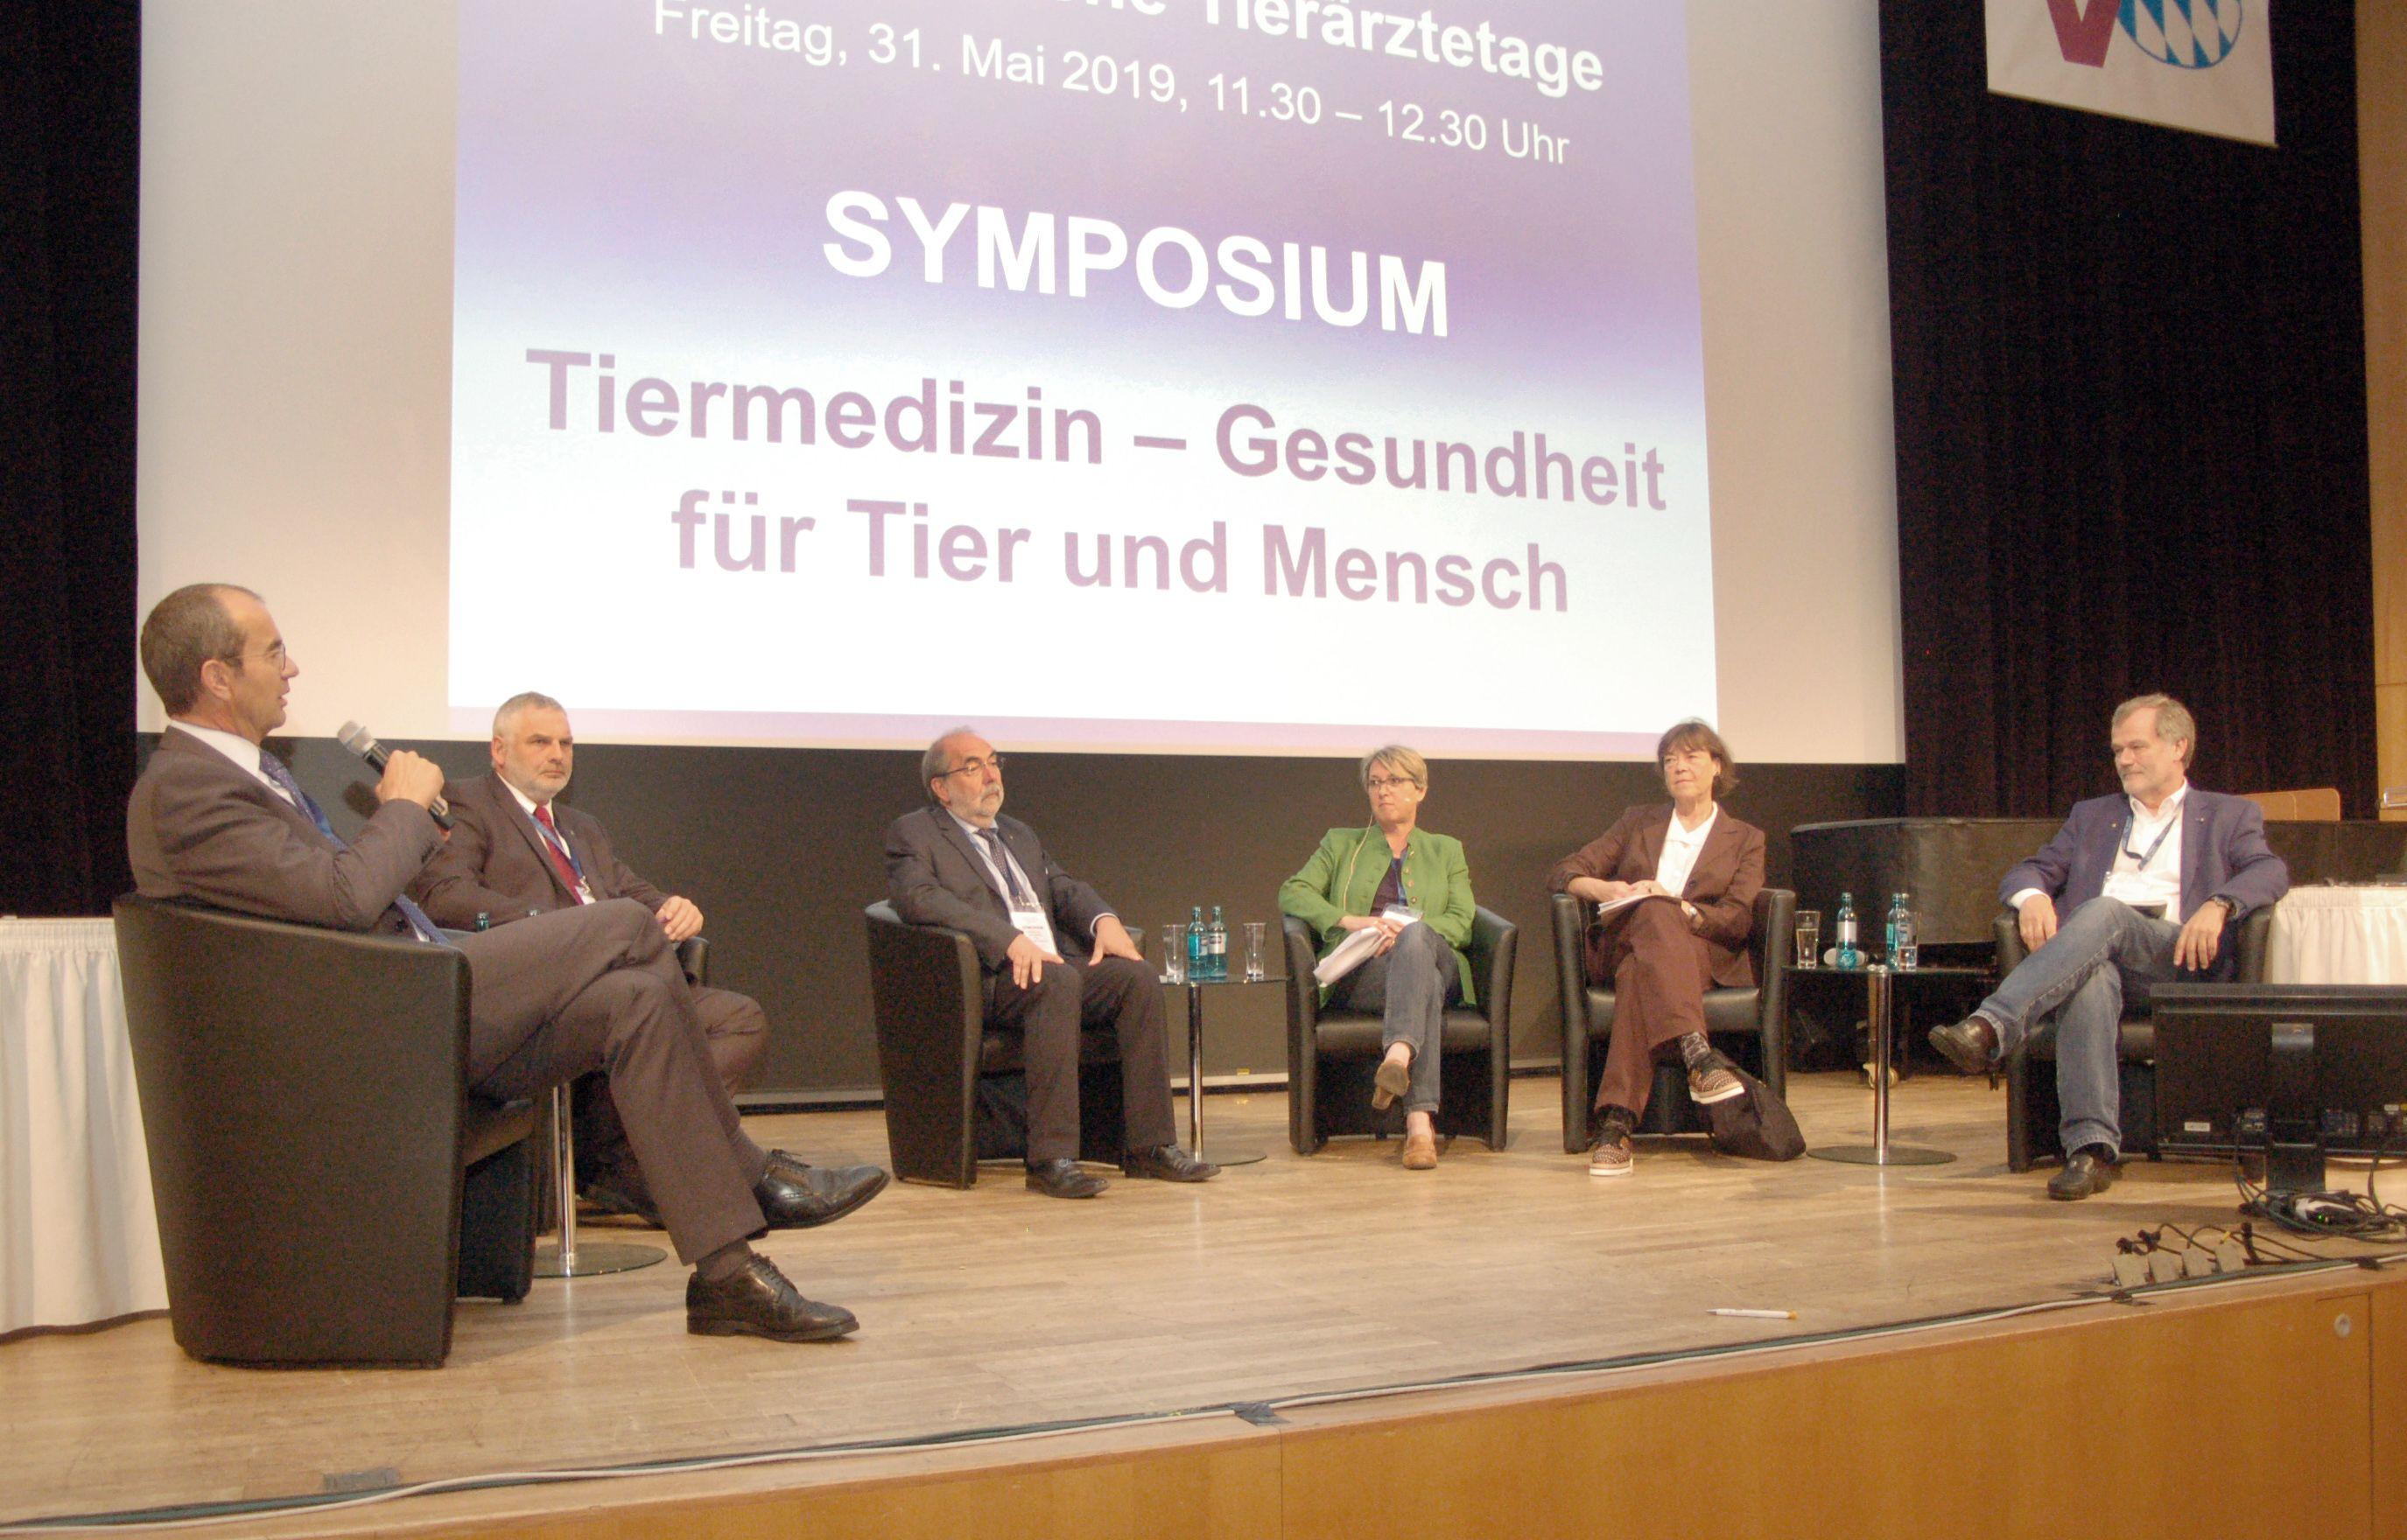 Symposium Tiermedizin auf dem BLTK 2019 in Nürnberg